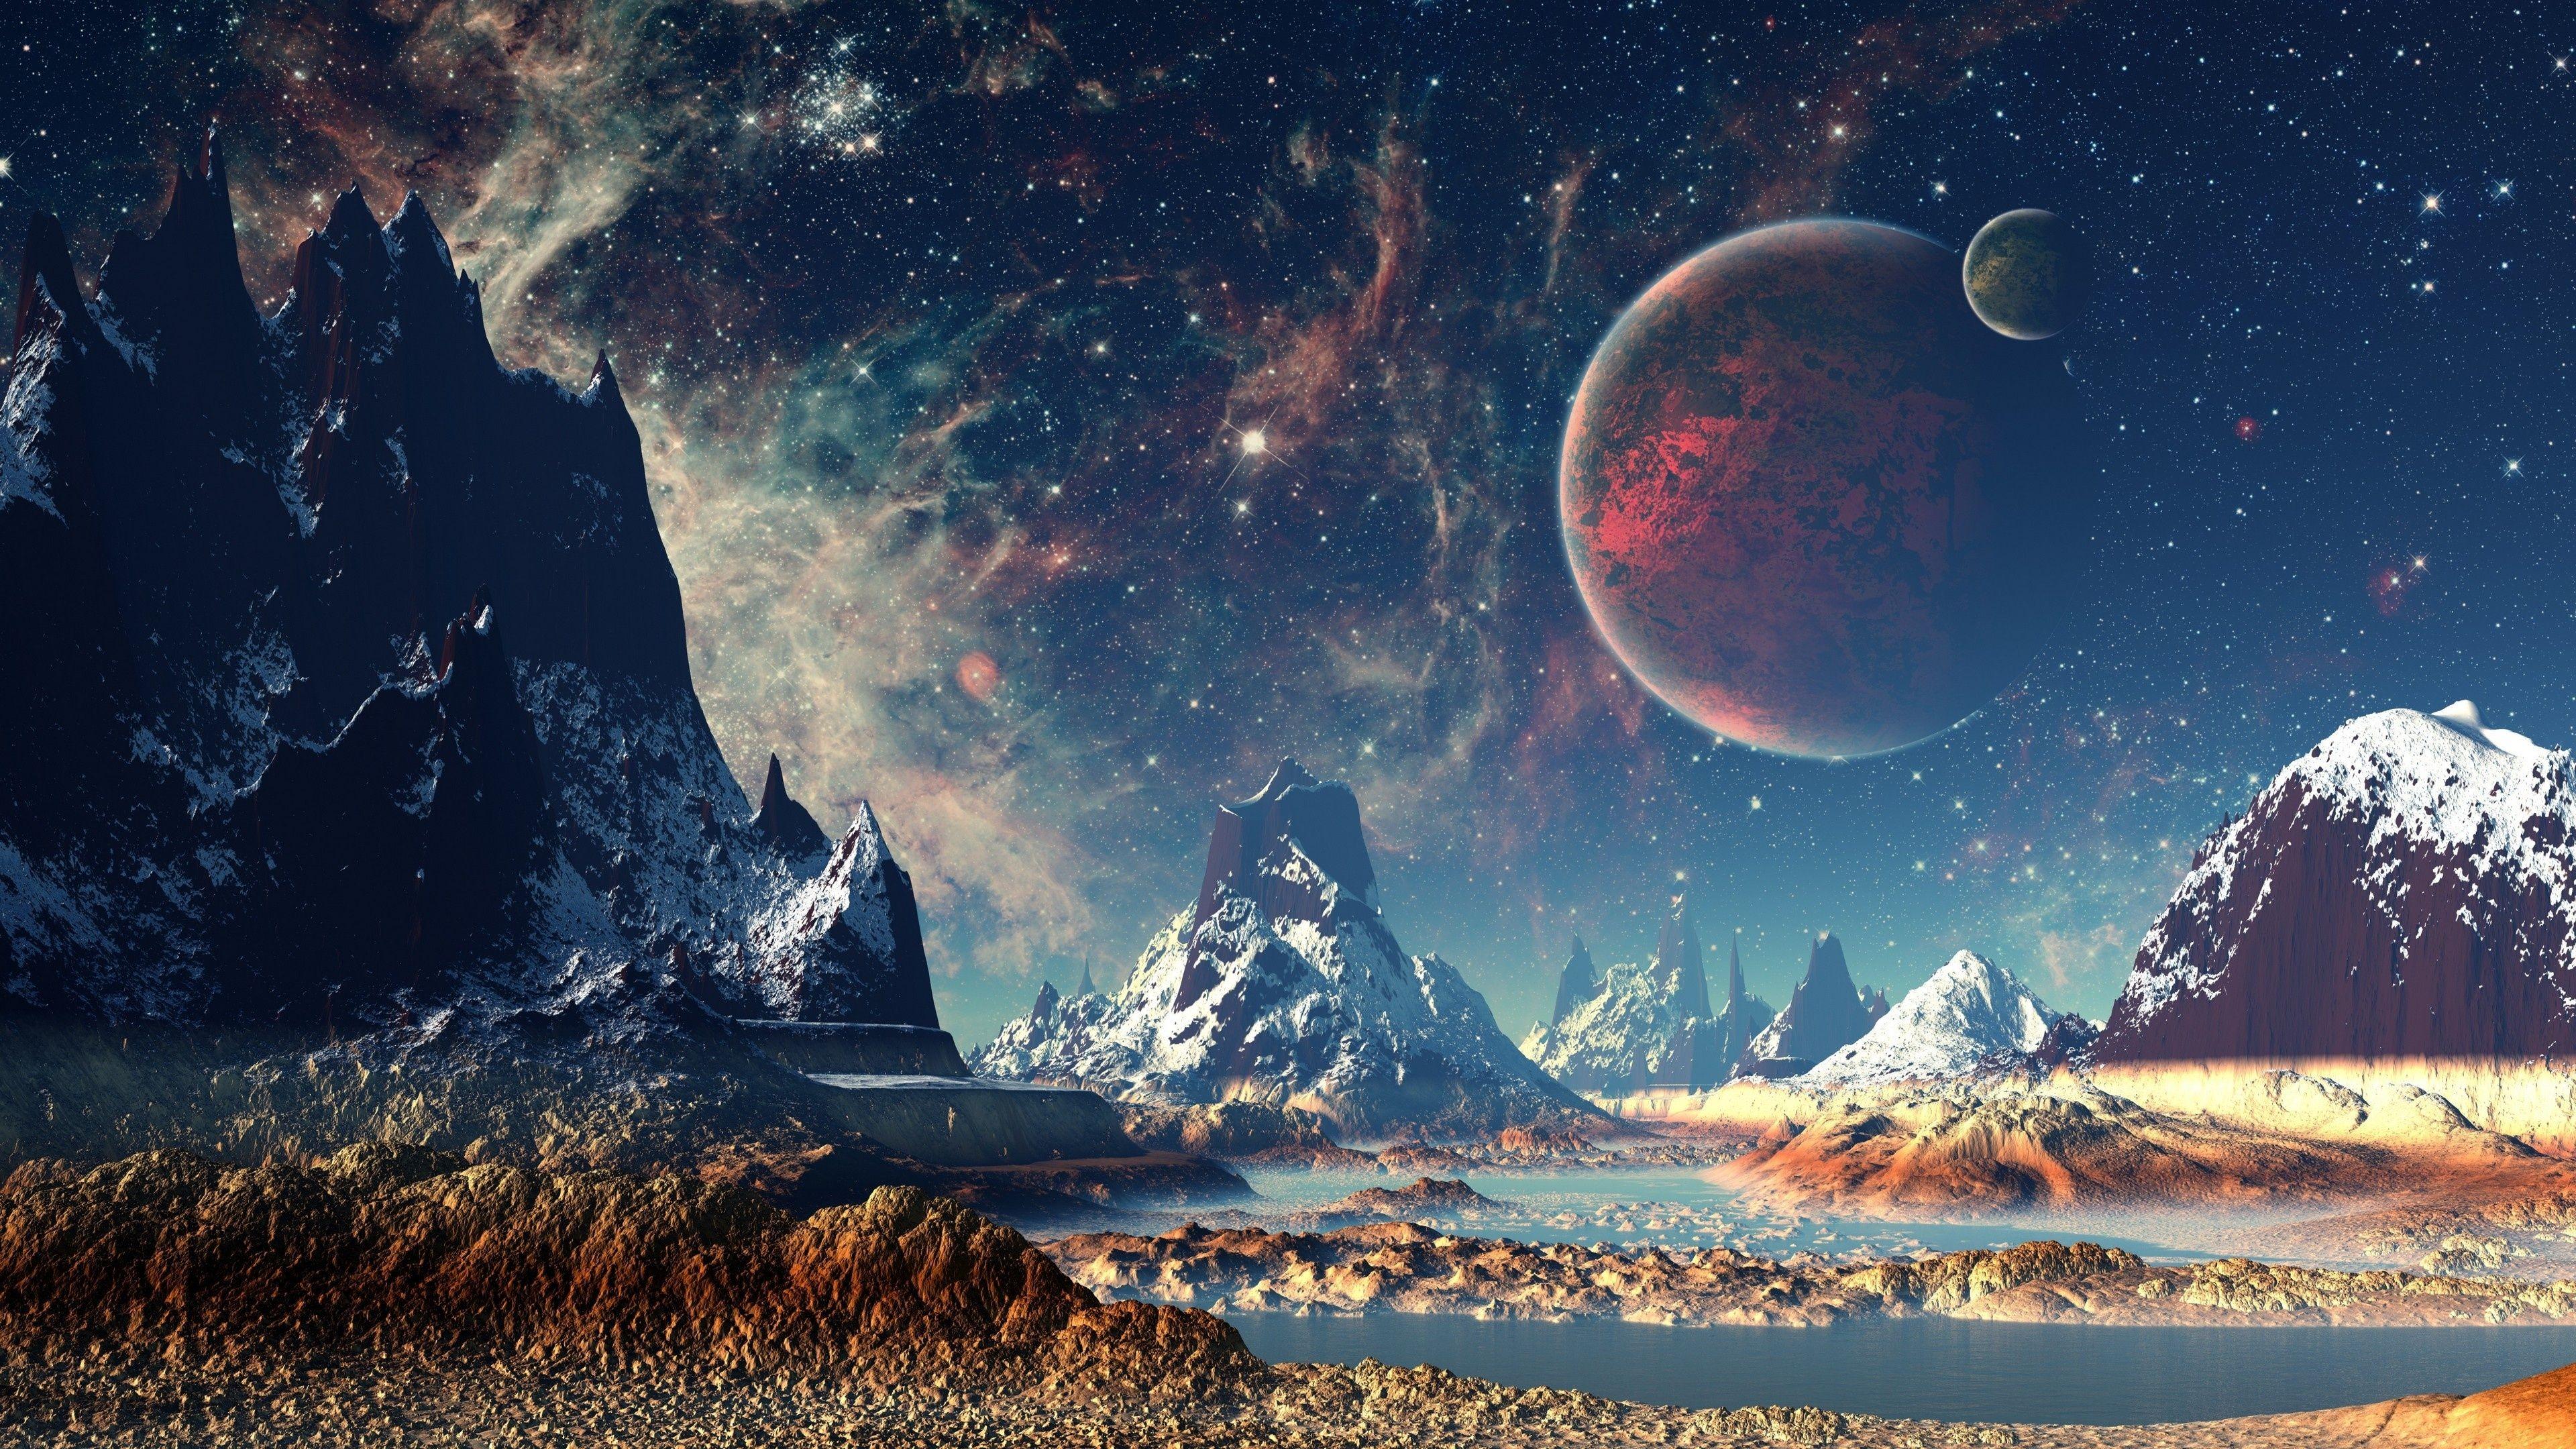 Planets Desktop Wallpapers   Top Planets Desktop Backgrounds 3840x2160